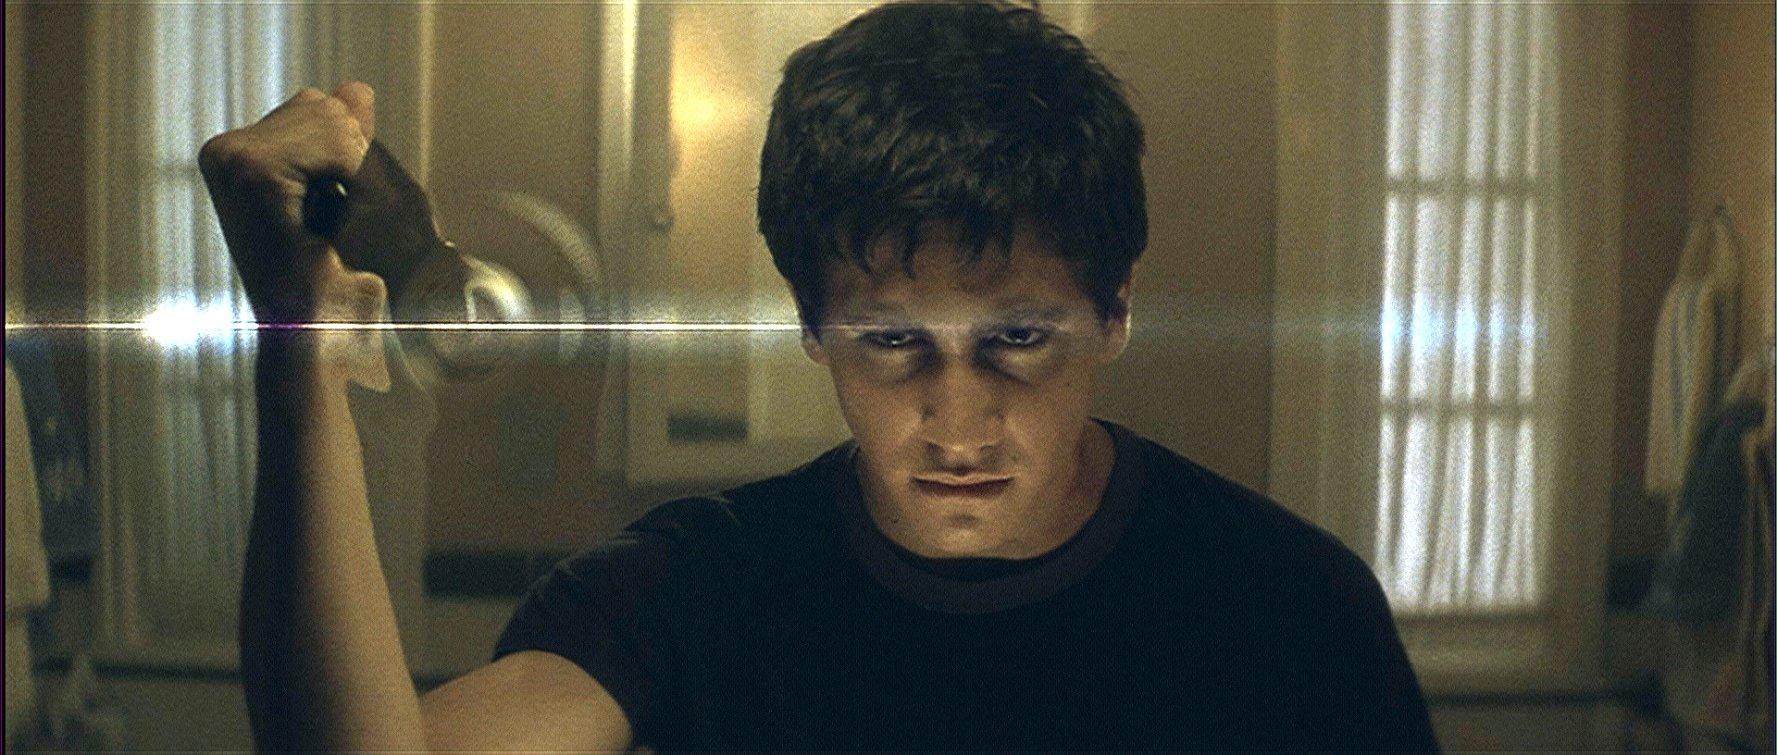 Jake Gyllenhaal en Donnie Darko (2001), dirigida por Richard Kelly